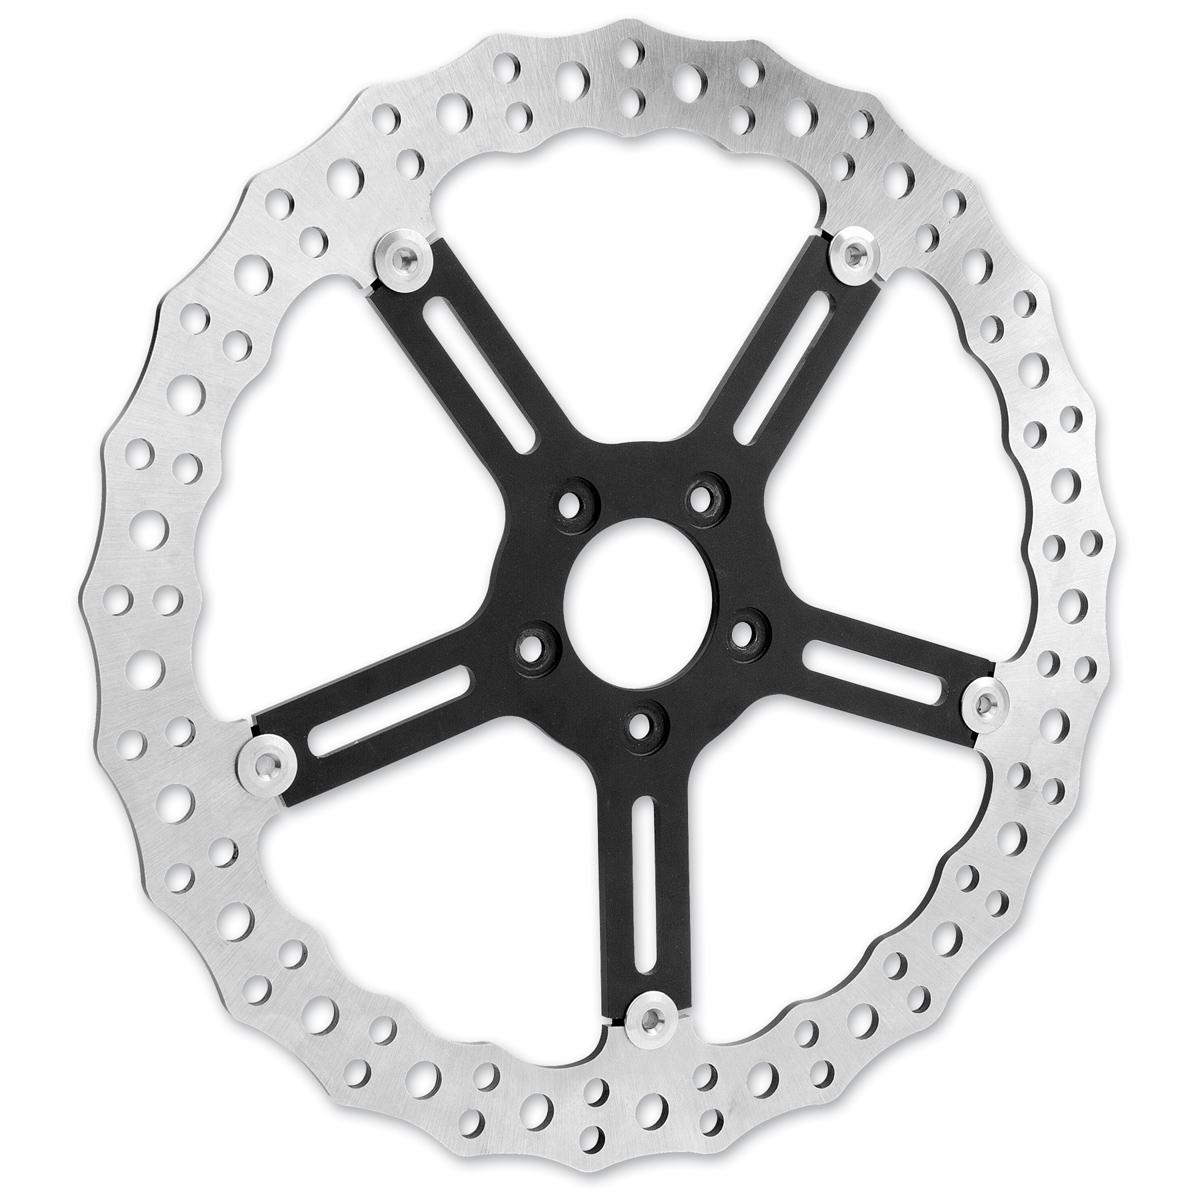 Arlen Ness 15″ Oversize Jagged Right Hub Mount Rotor